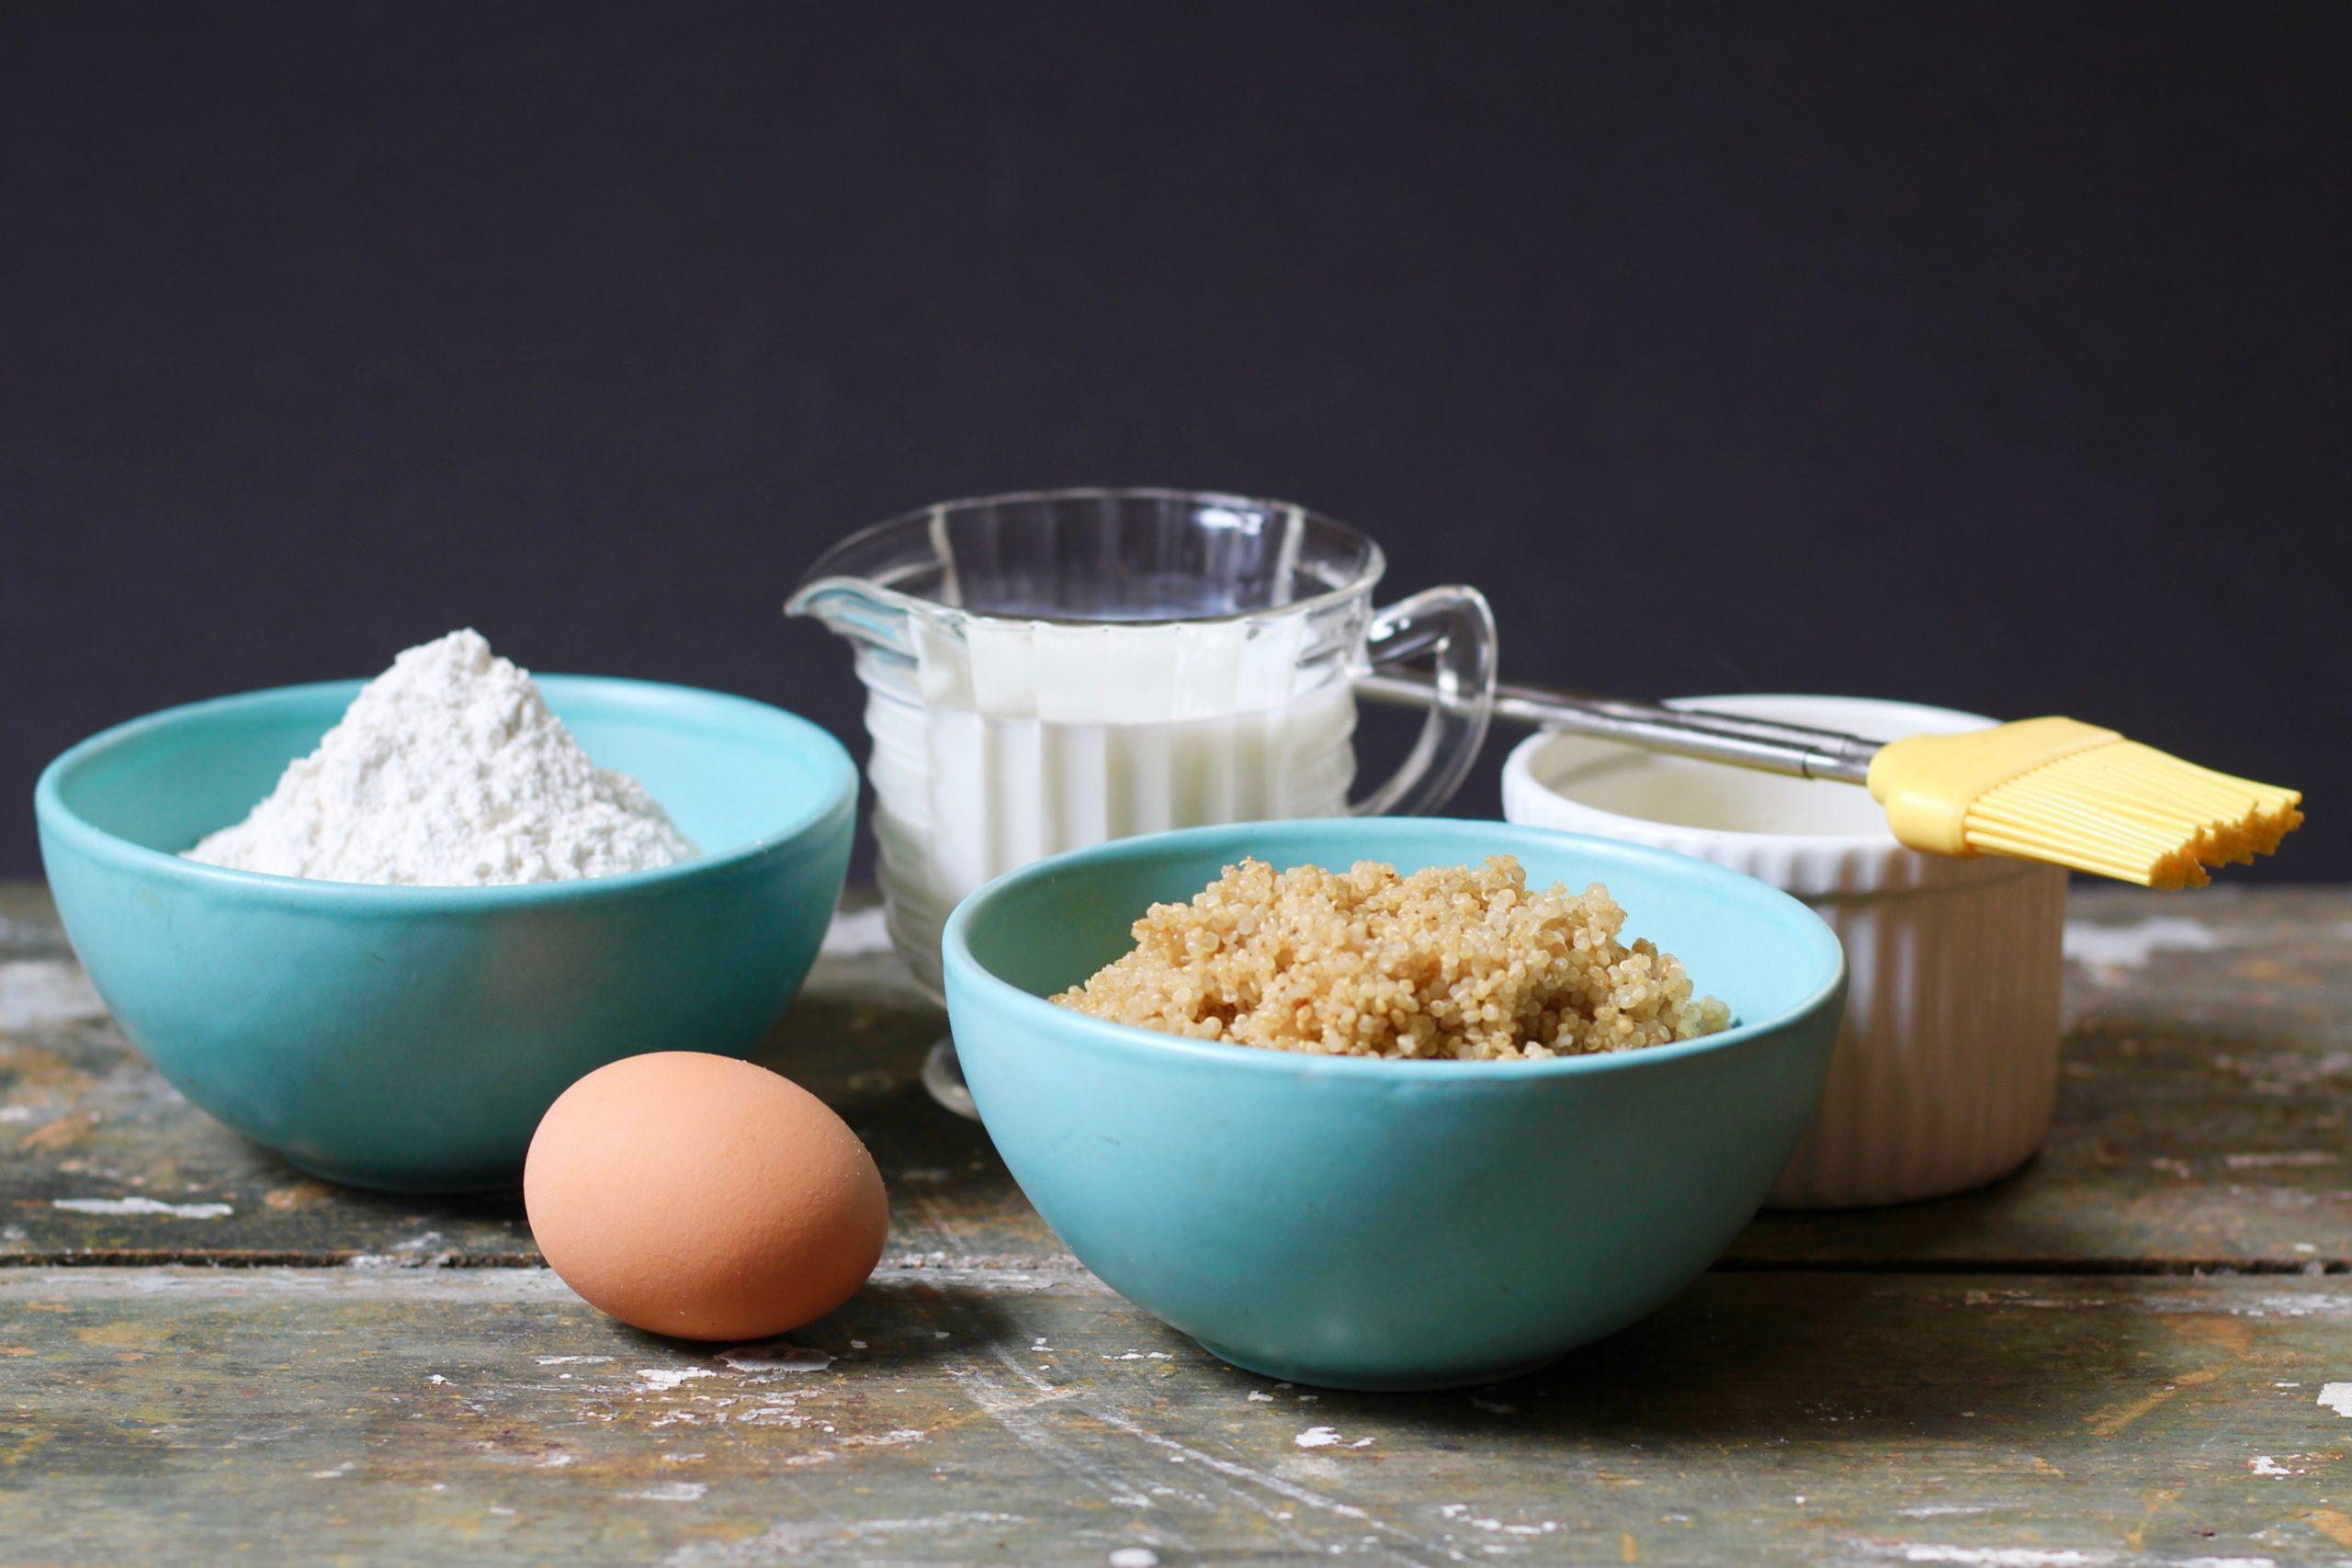 ingredients for quinoa pancakes